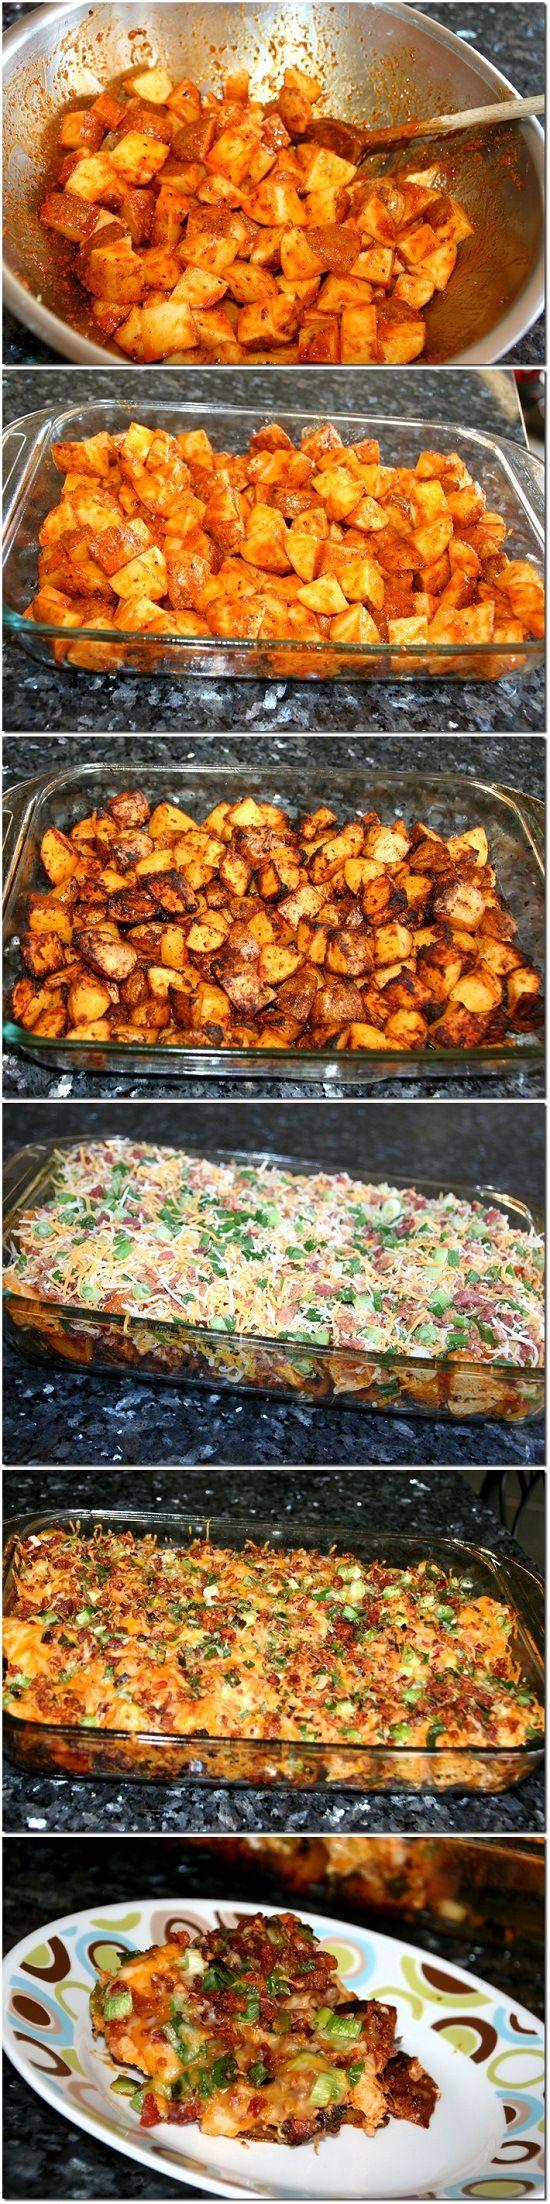 | Loaded Potato And Buffalo Chicken Casserole